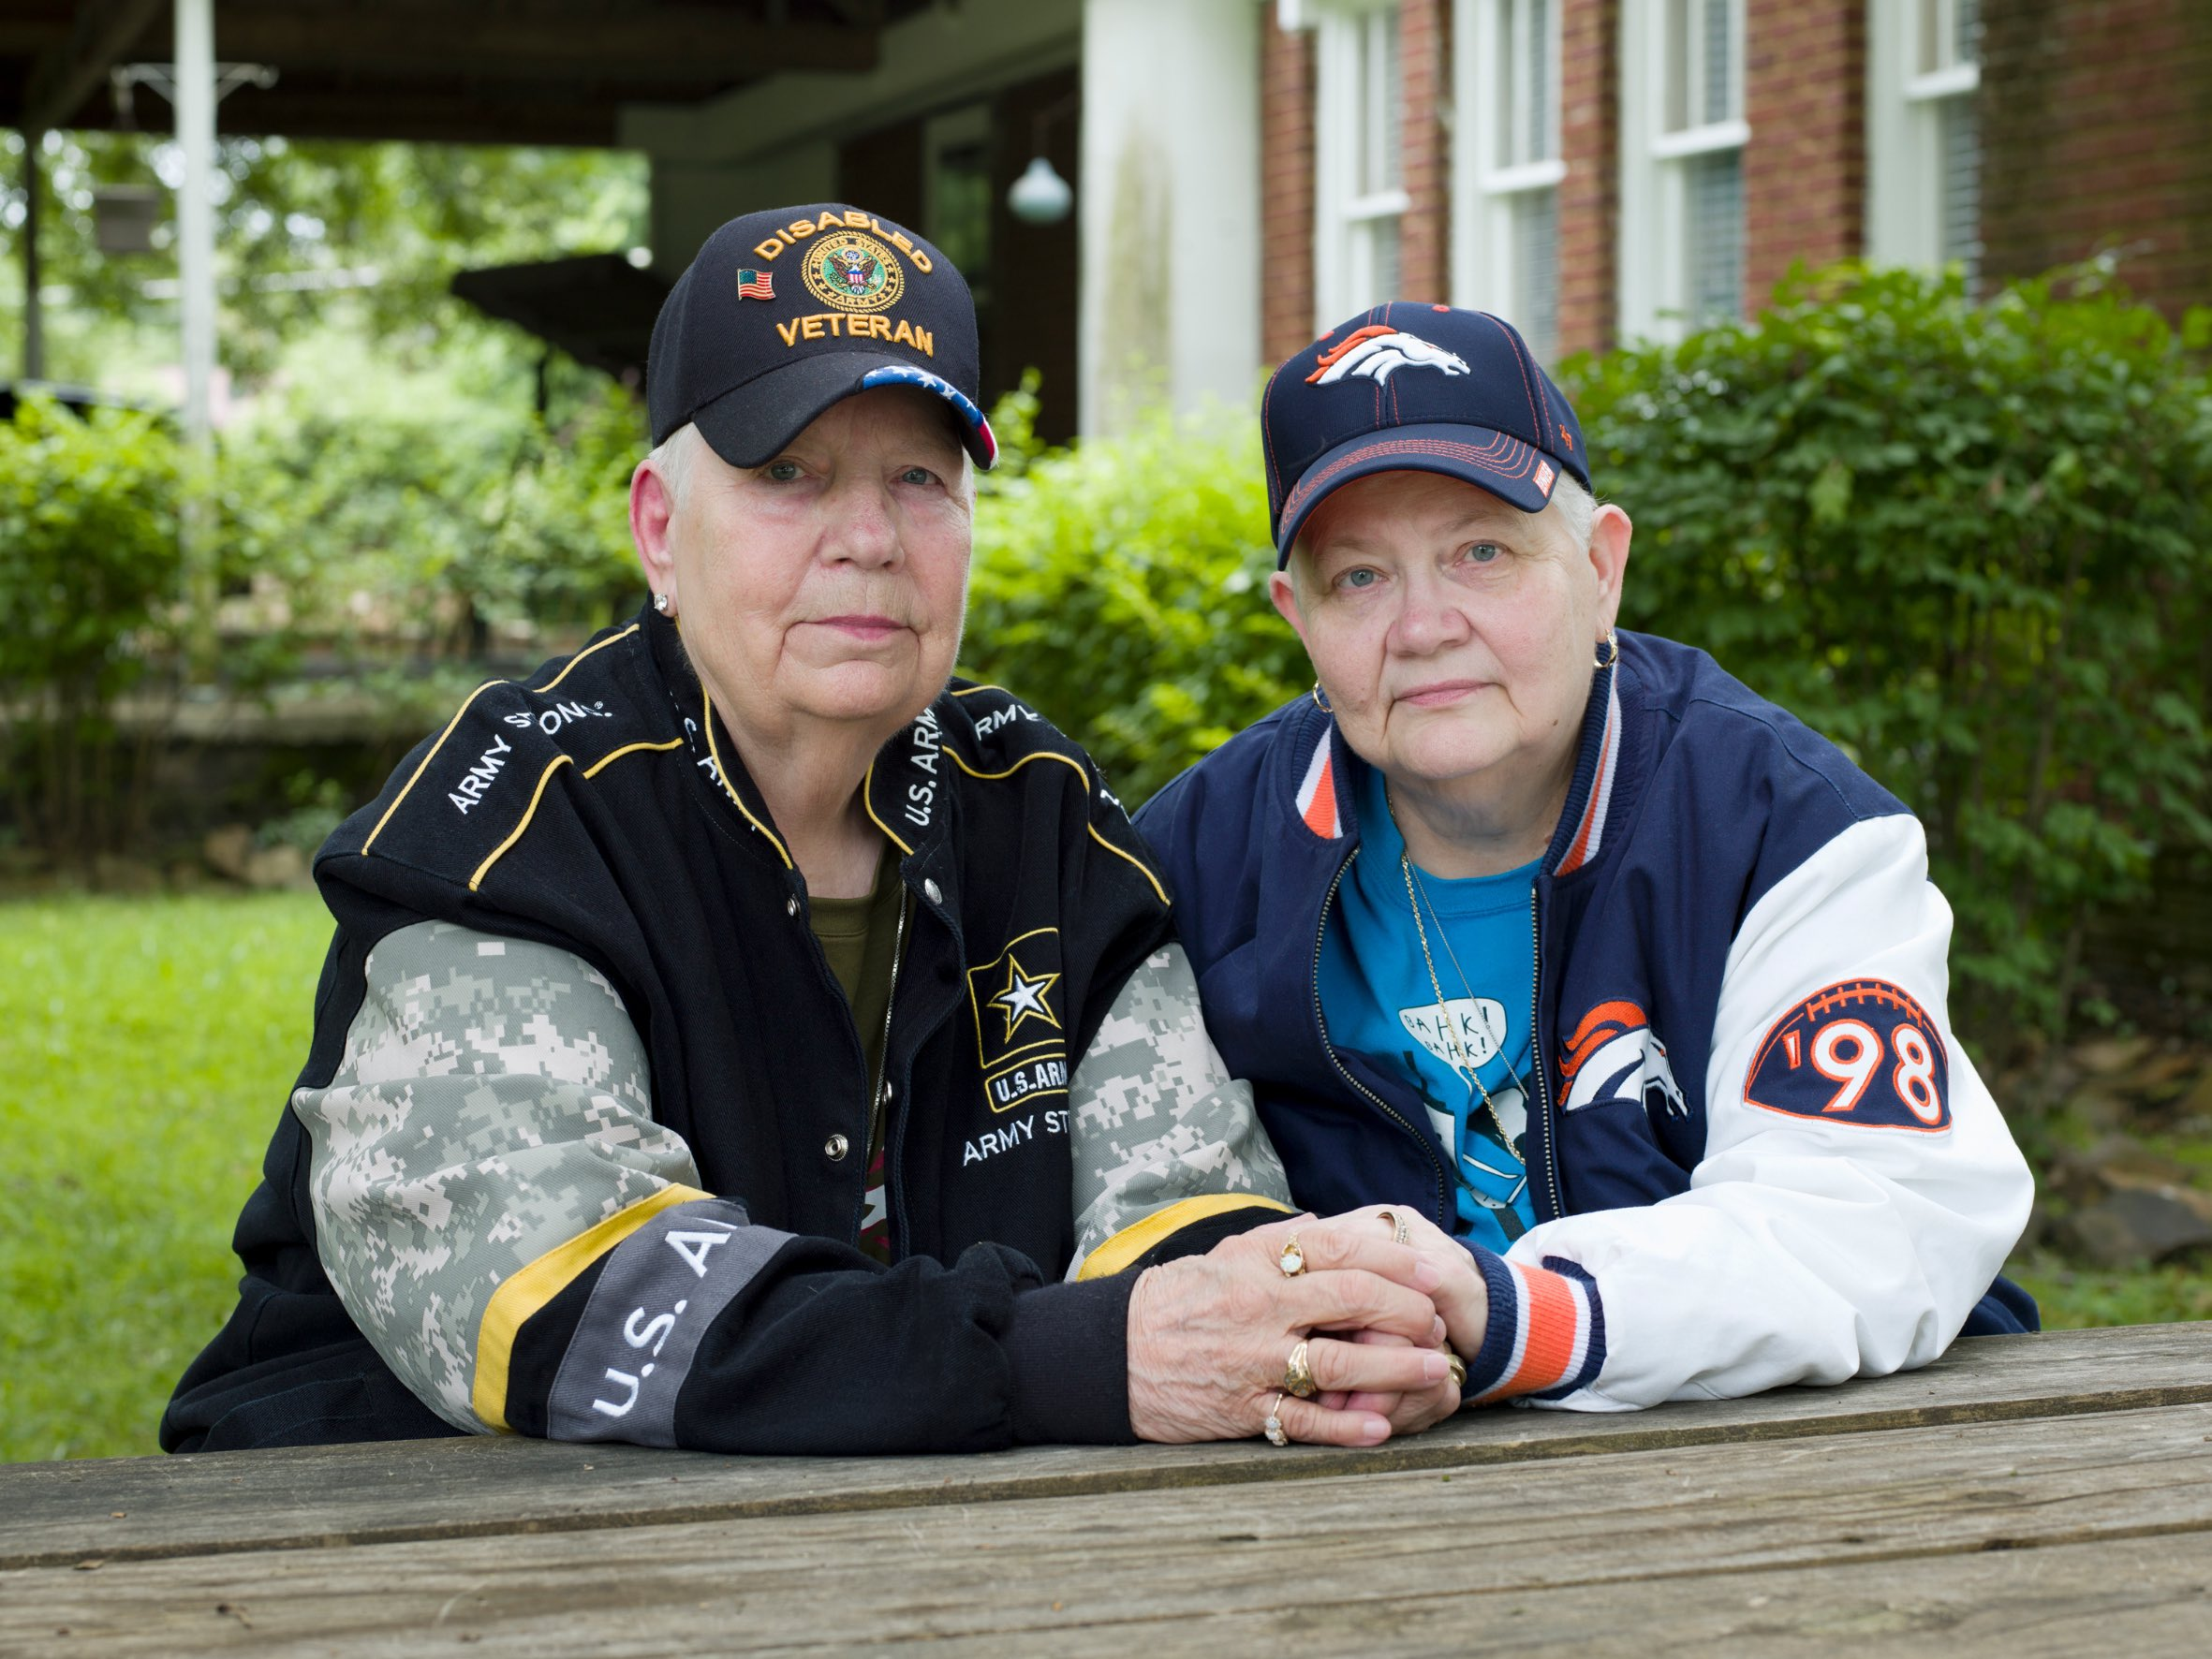 2_Hank, 76, and Samm, 67, North Little Rock, AR, 2015 © Jess T. Dugan